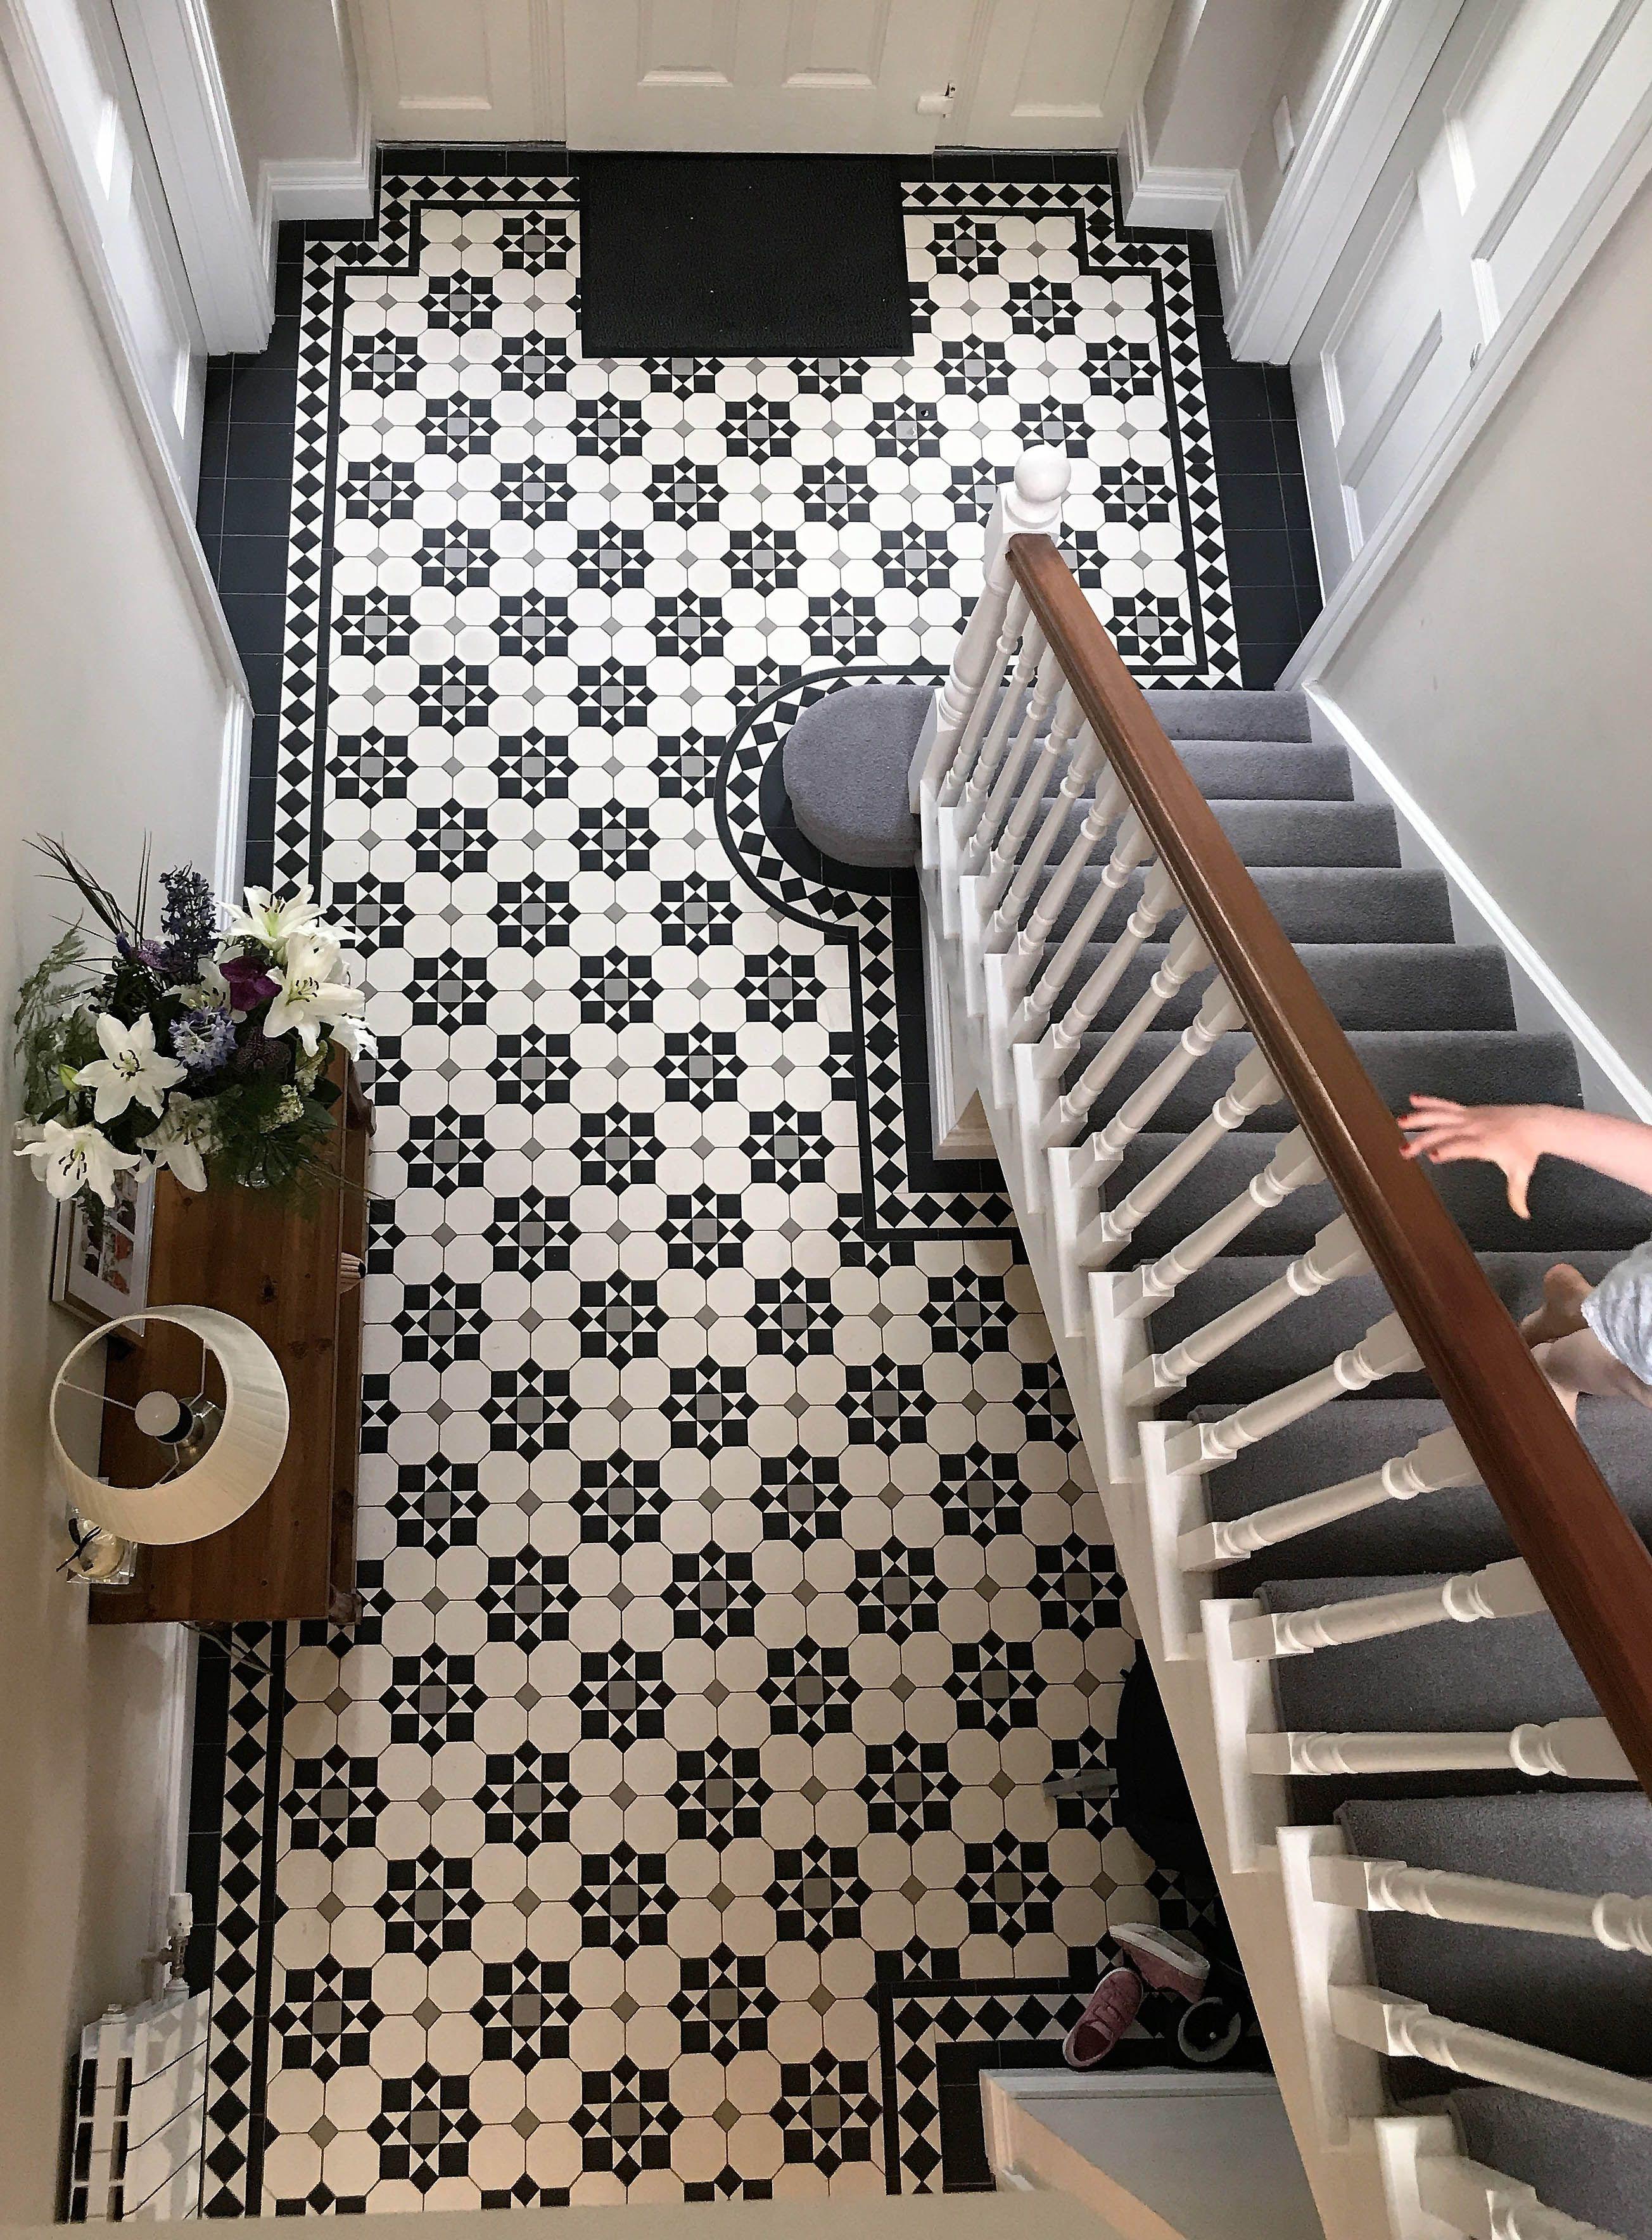 Pin By Evartstudio On Interiors Hallway Flooring Tiled